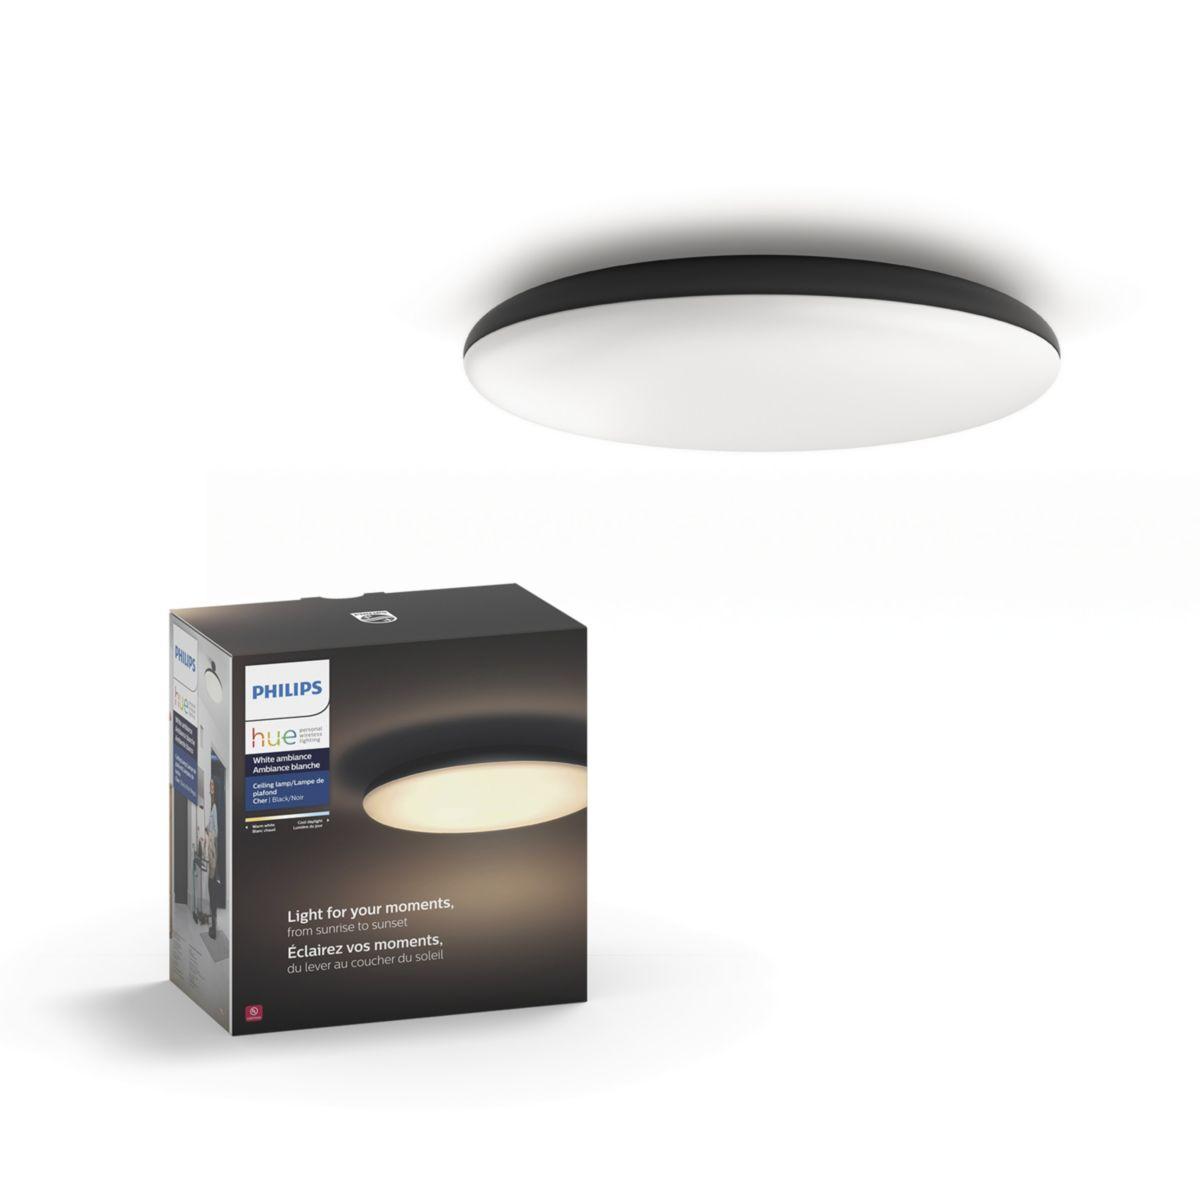 Buy the PHILIPS Hue White ambiance Cher ceiling light 4096730U7 Cher  ceiling light